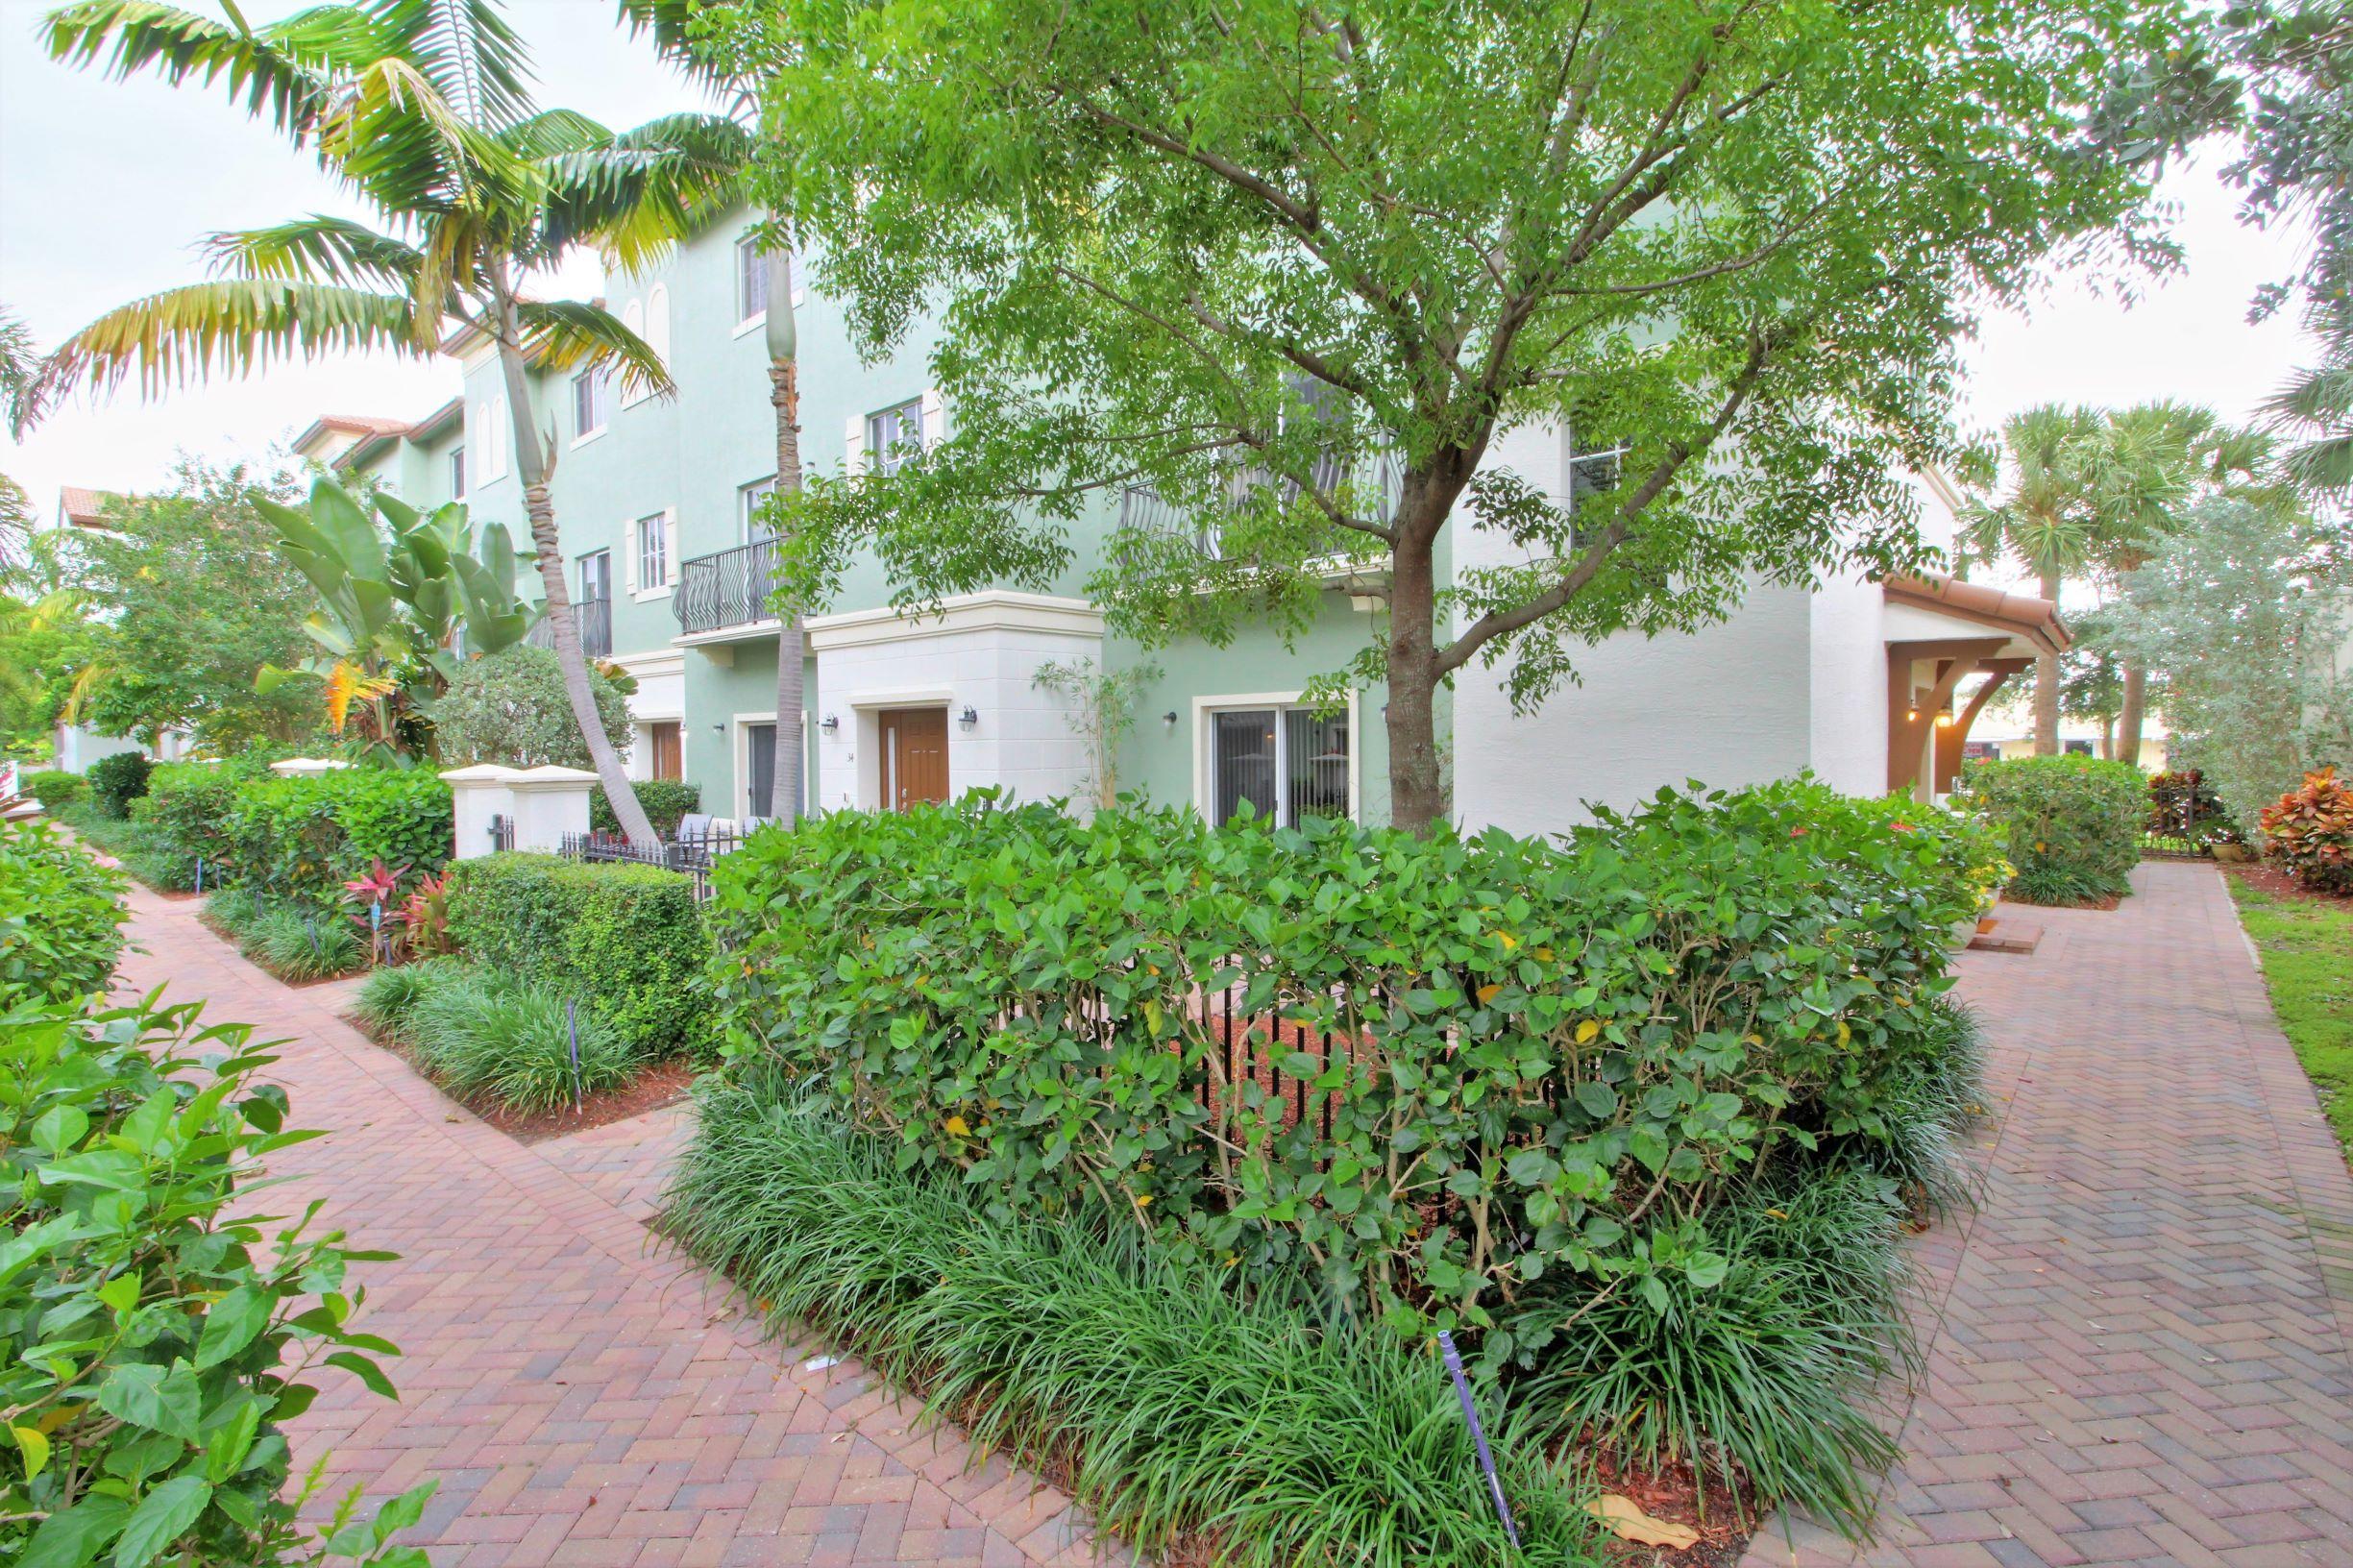 24 Nw 7th Street, Boca Raton, FL 33432